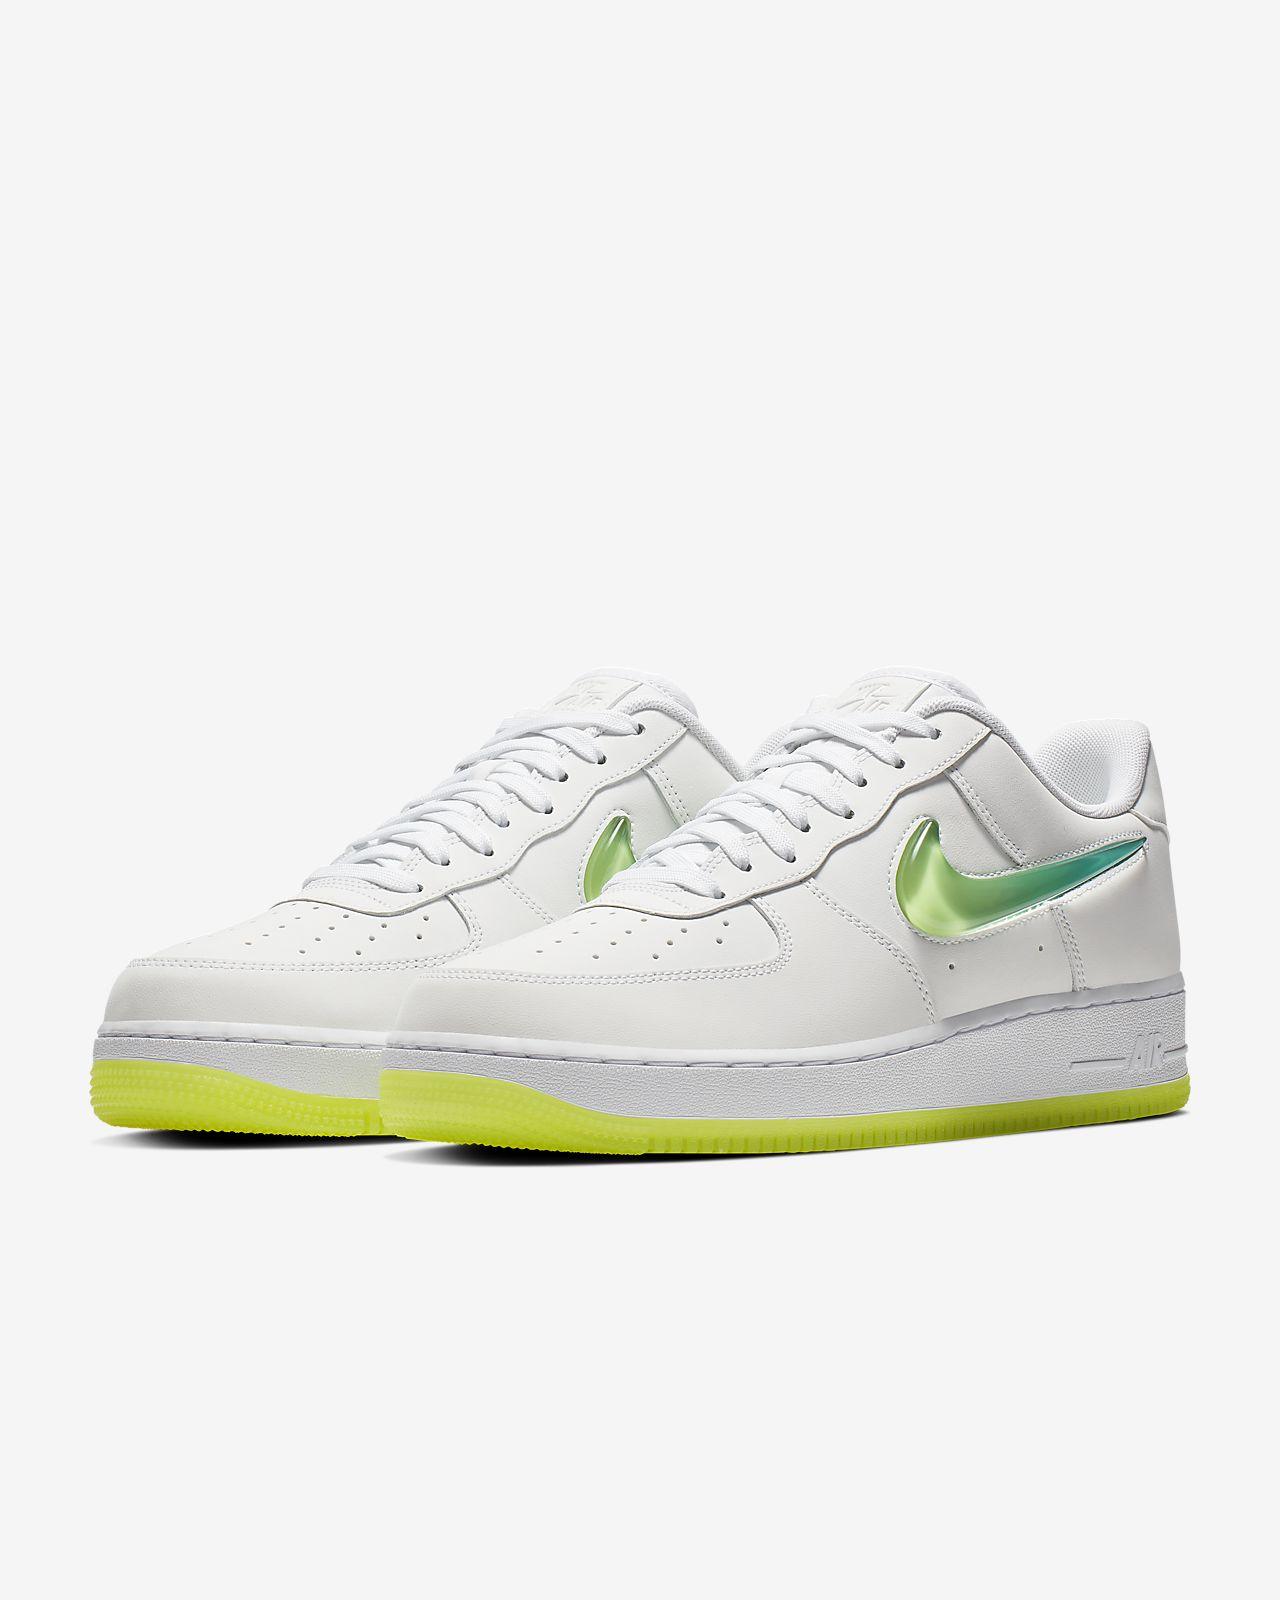 4c79b5a81bba0 Nike Air Force 1 '07 Premium 2 Men's Shoe. Nike.com IN